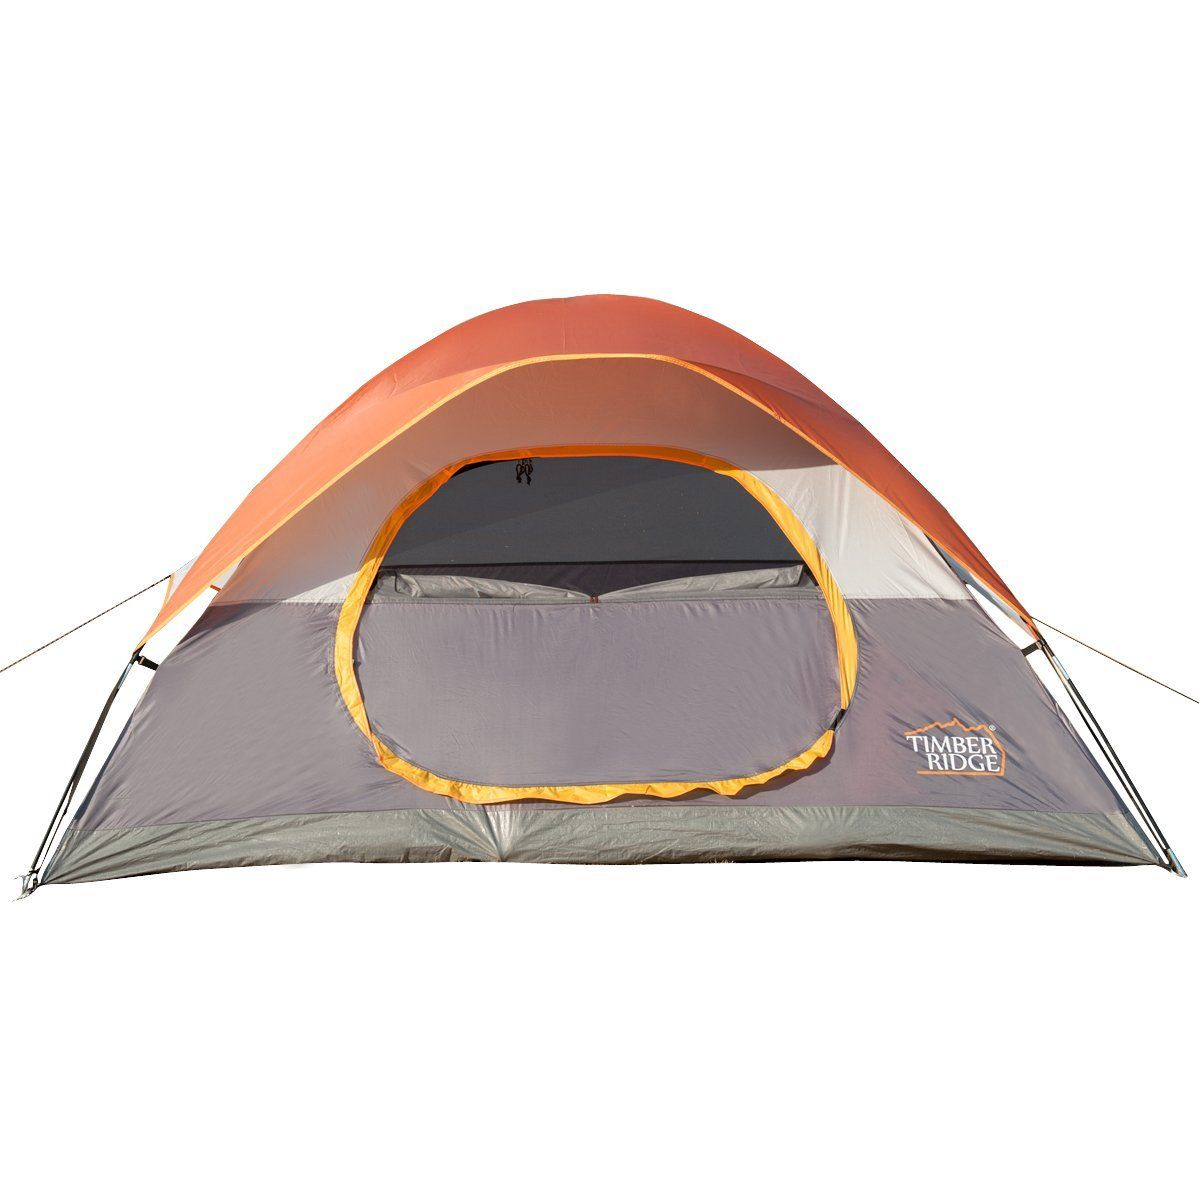 Timber Ridge Lightweight Family C&ing Tent with Compression Bag O-Shape Door 3  sc 1 st  Pinterest & Timber Ridge Lightweight Family Camping Tent with Compression Bag ...